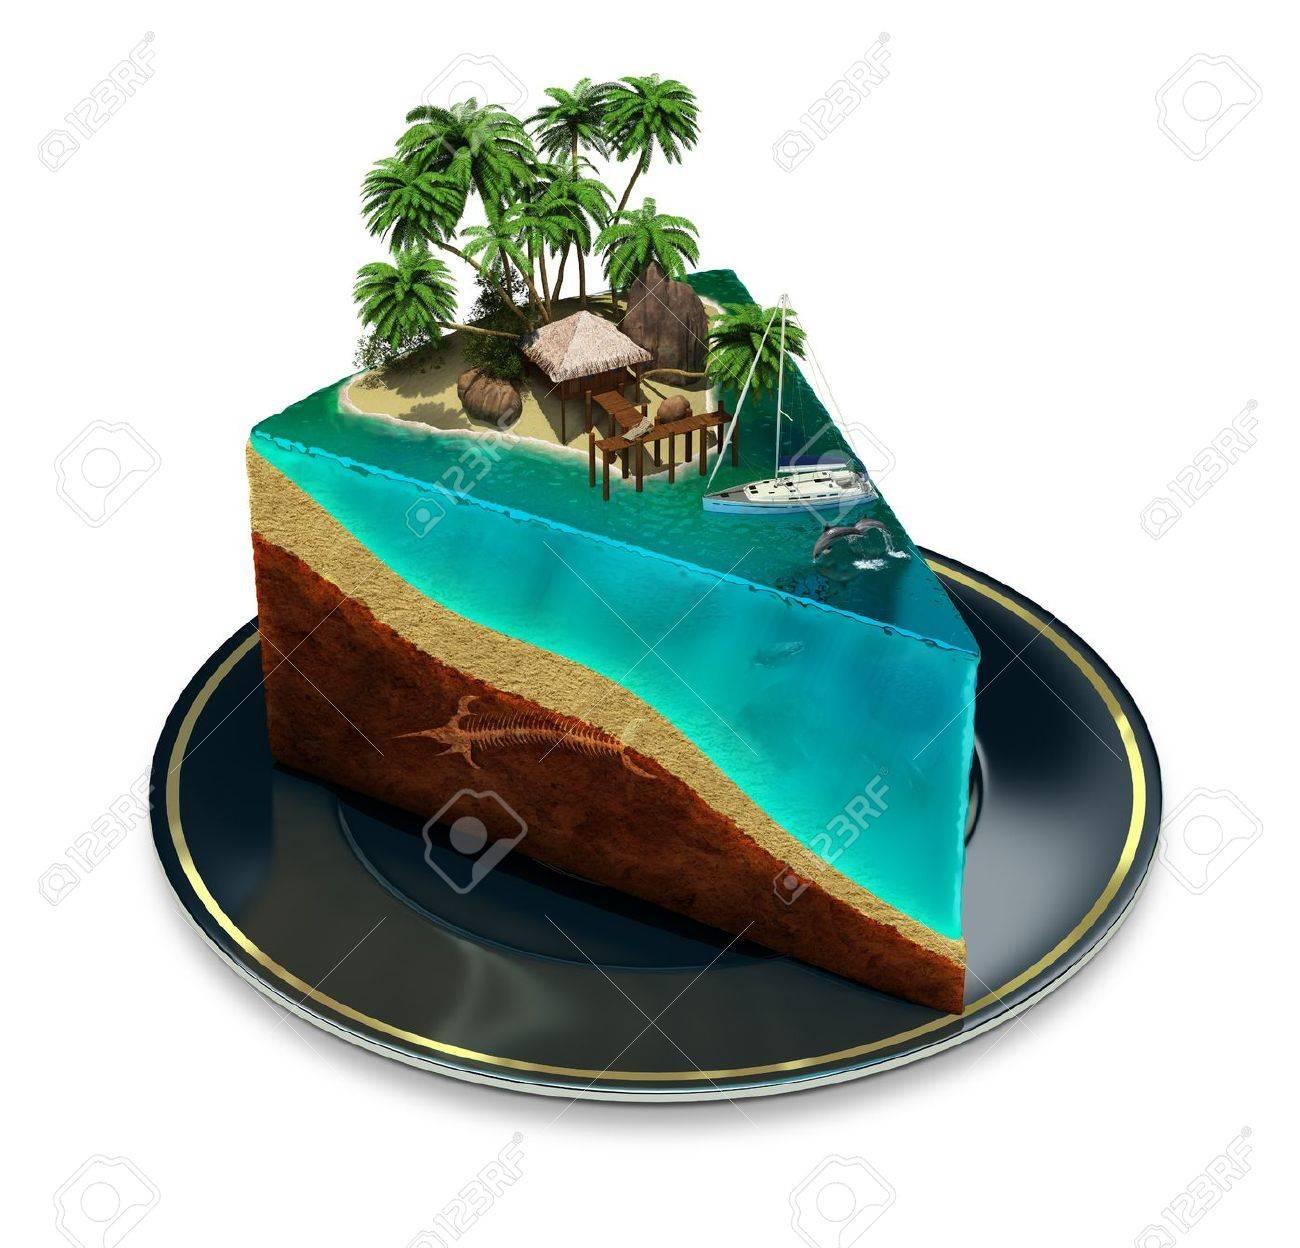 Image result for idyllic oasis + cake